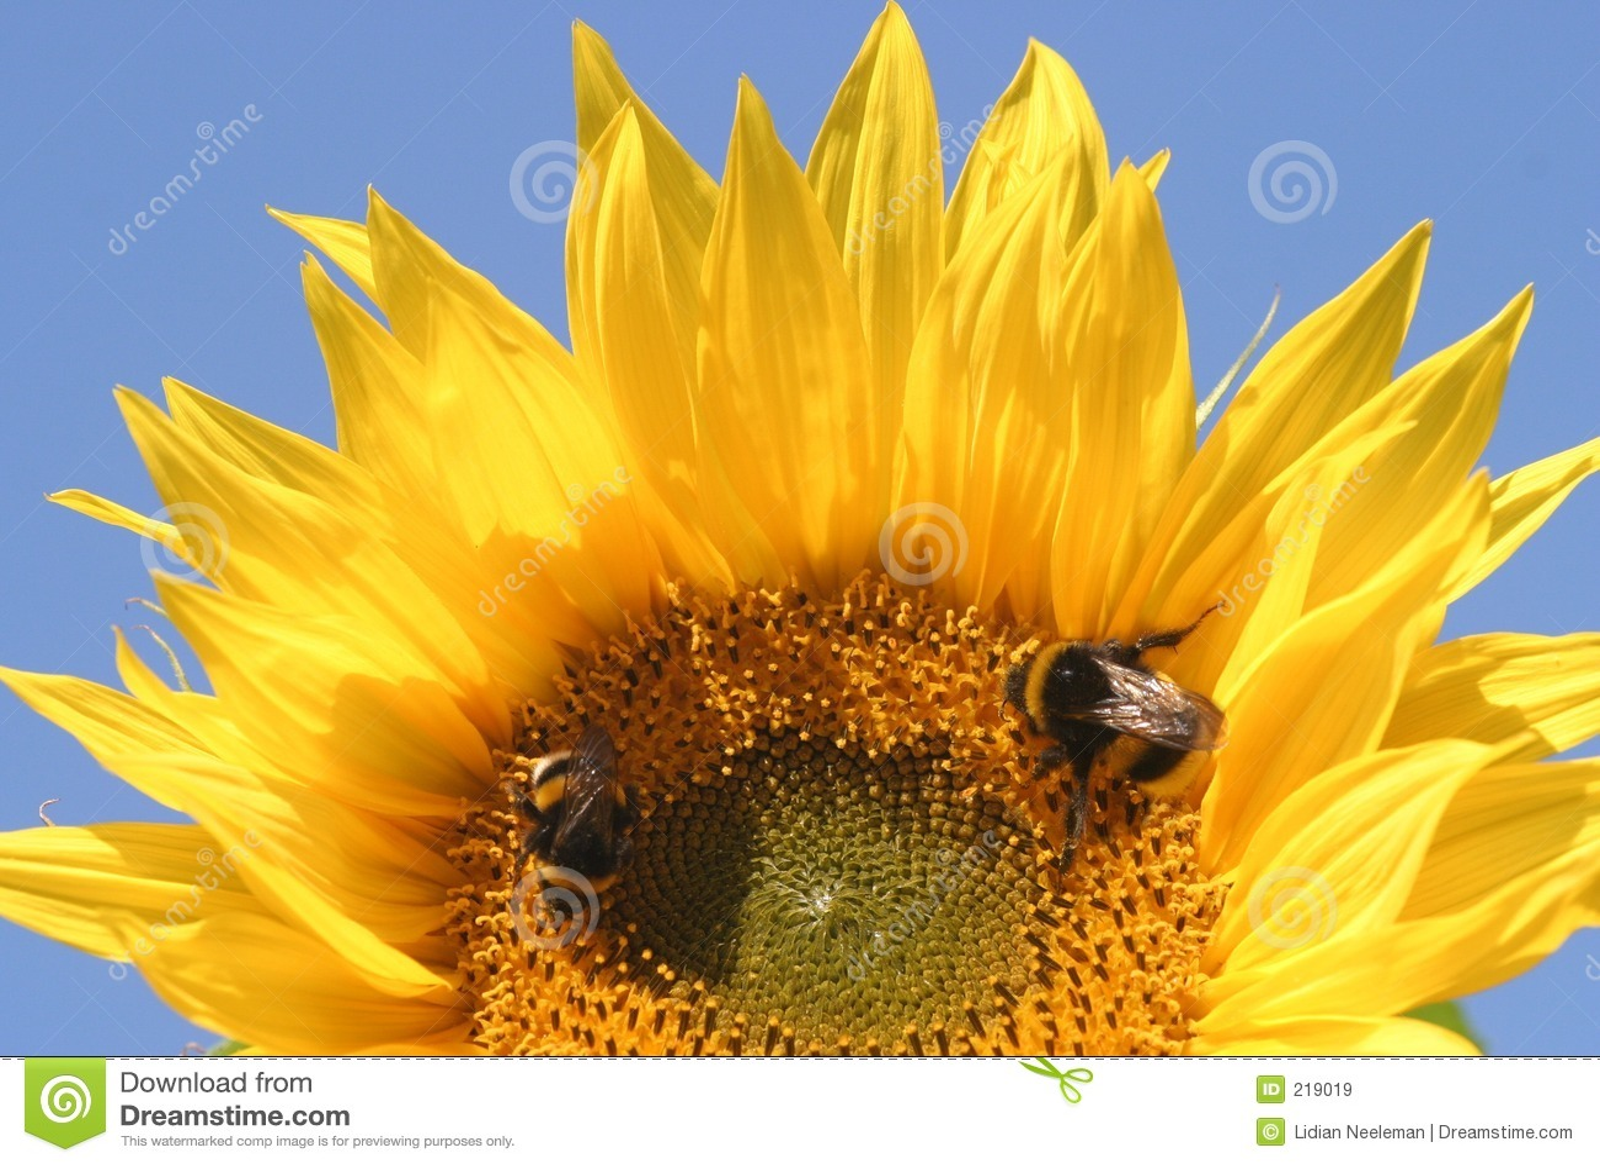 Girasole e 2 api